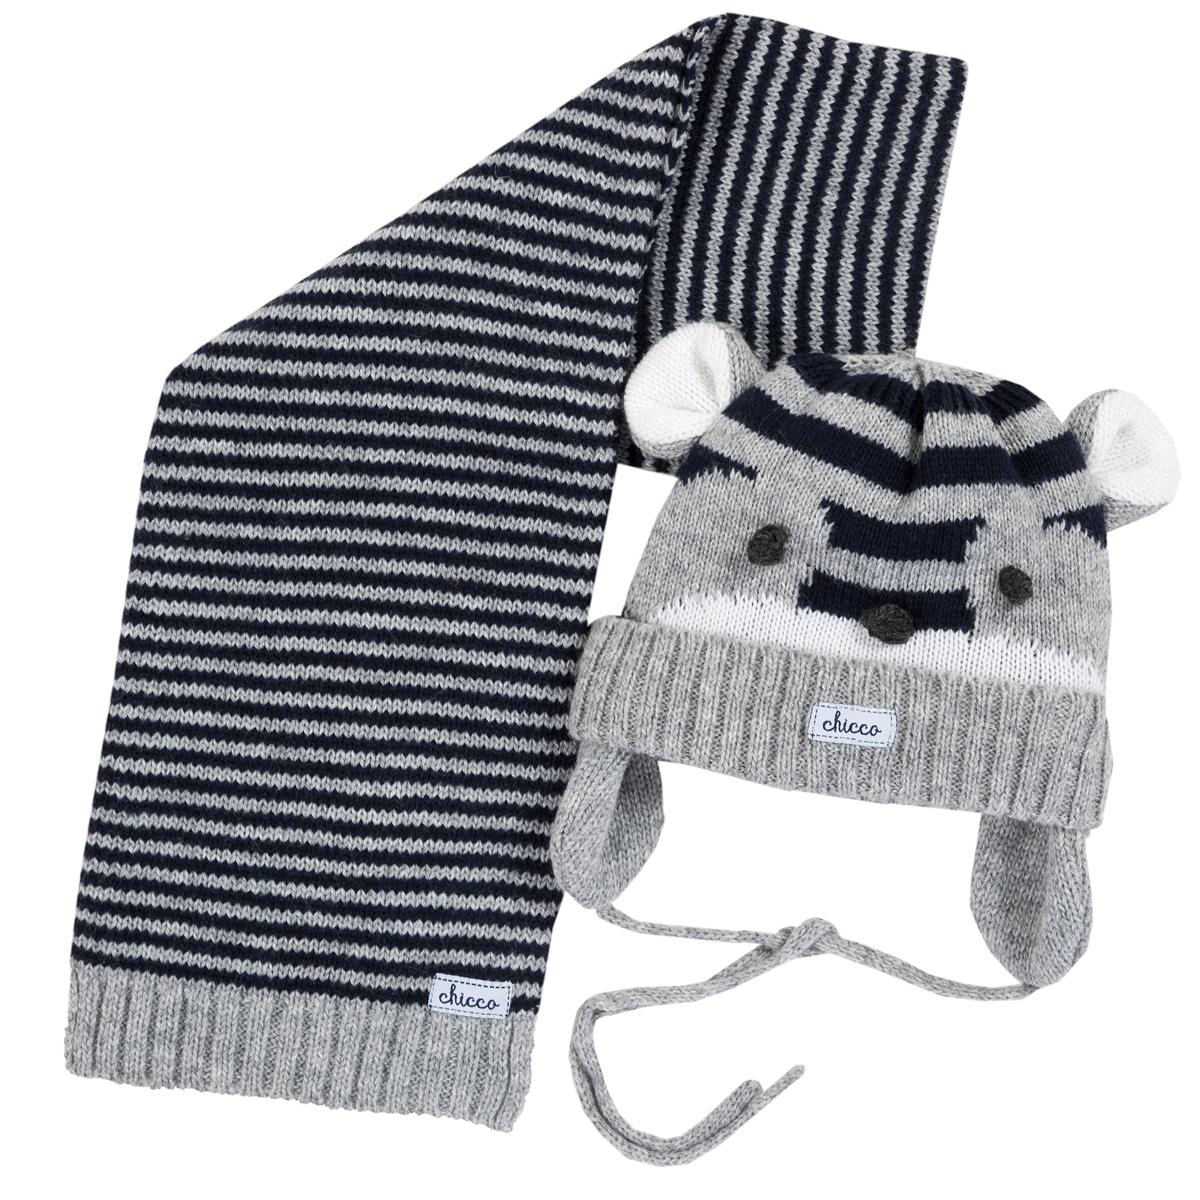 Set caciula copii si fular Chicco, tricotate, gri, 04492 din categoria Caciuli, Sepci